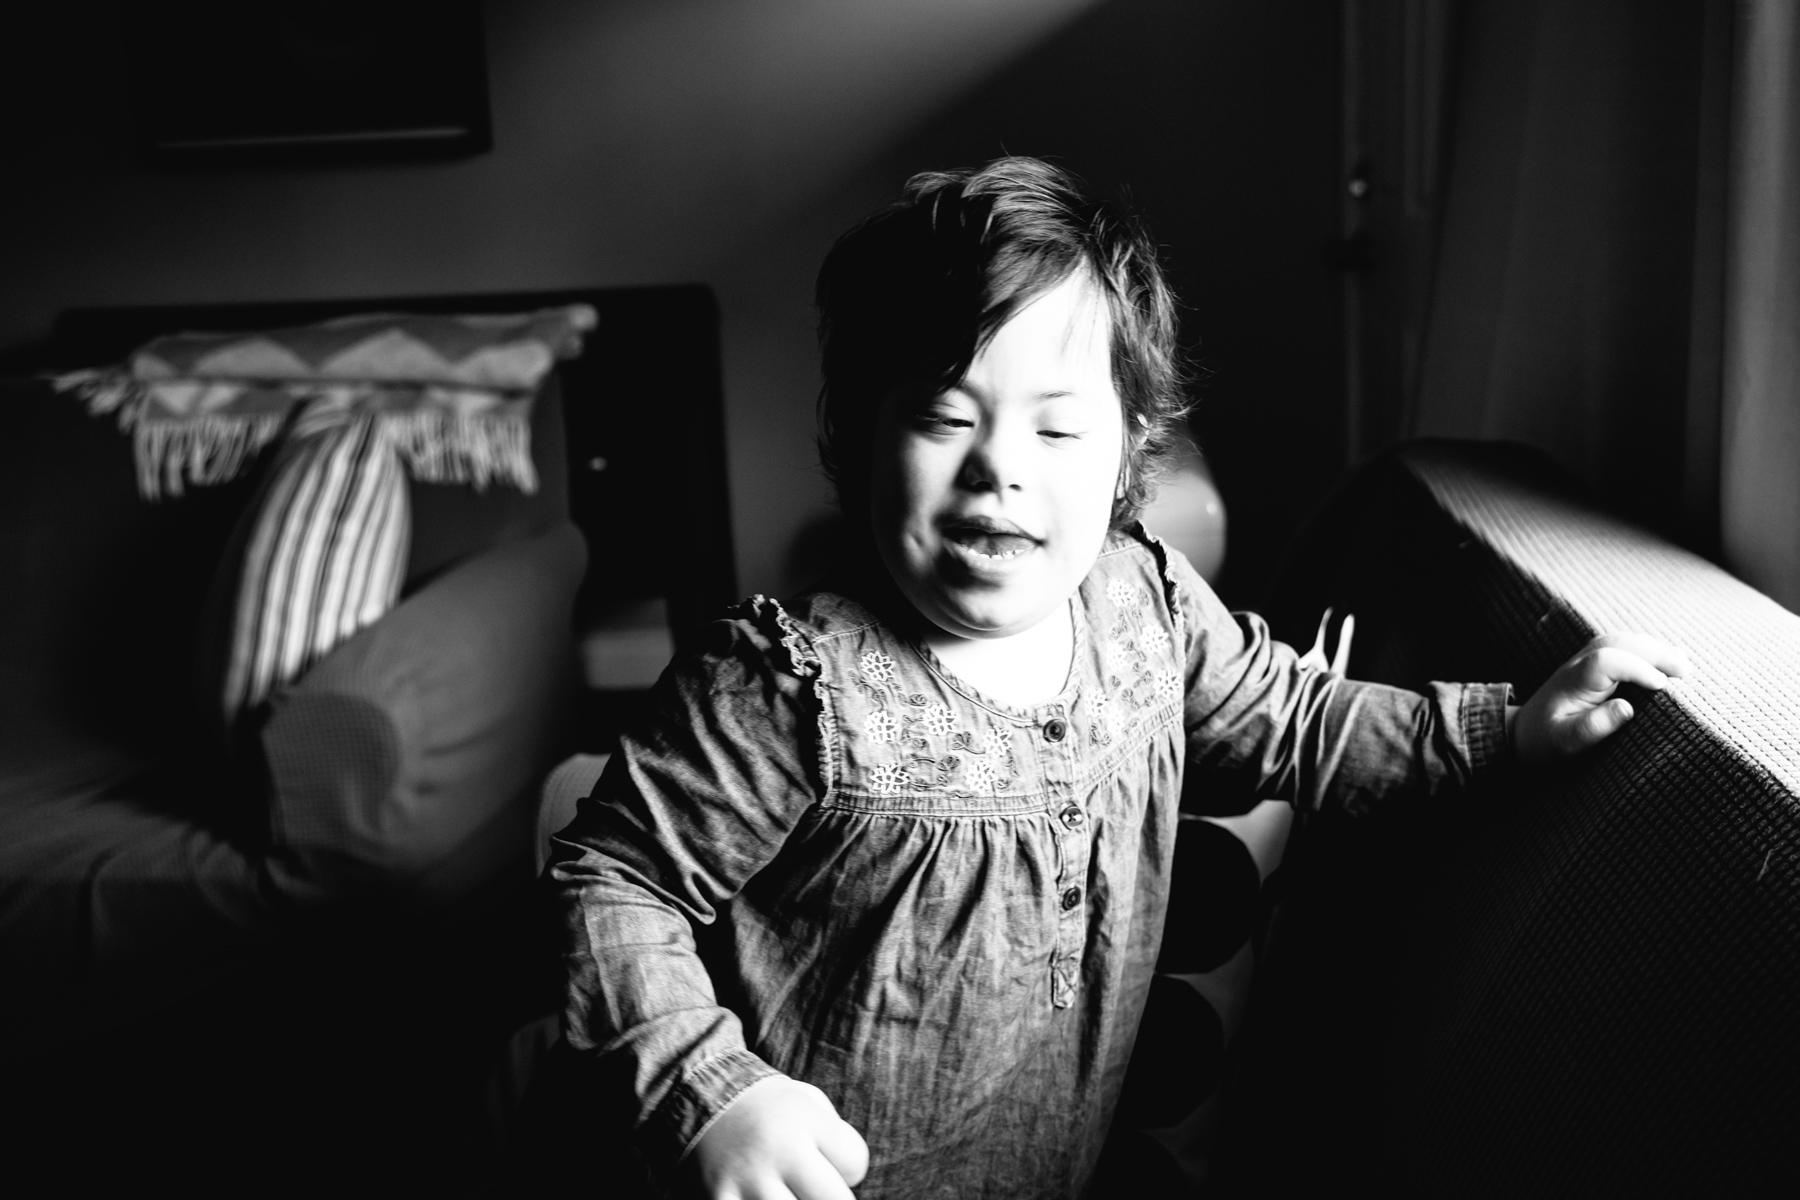 010-kandise-brown-fredericton-photographer-rowan2020